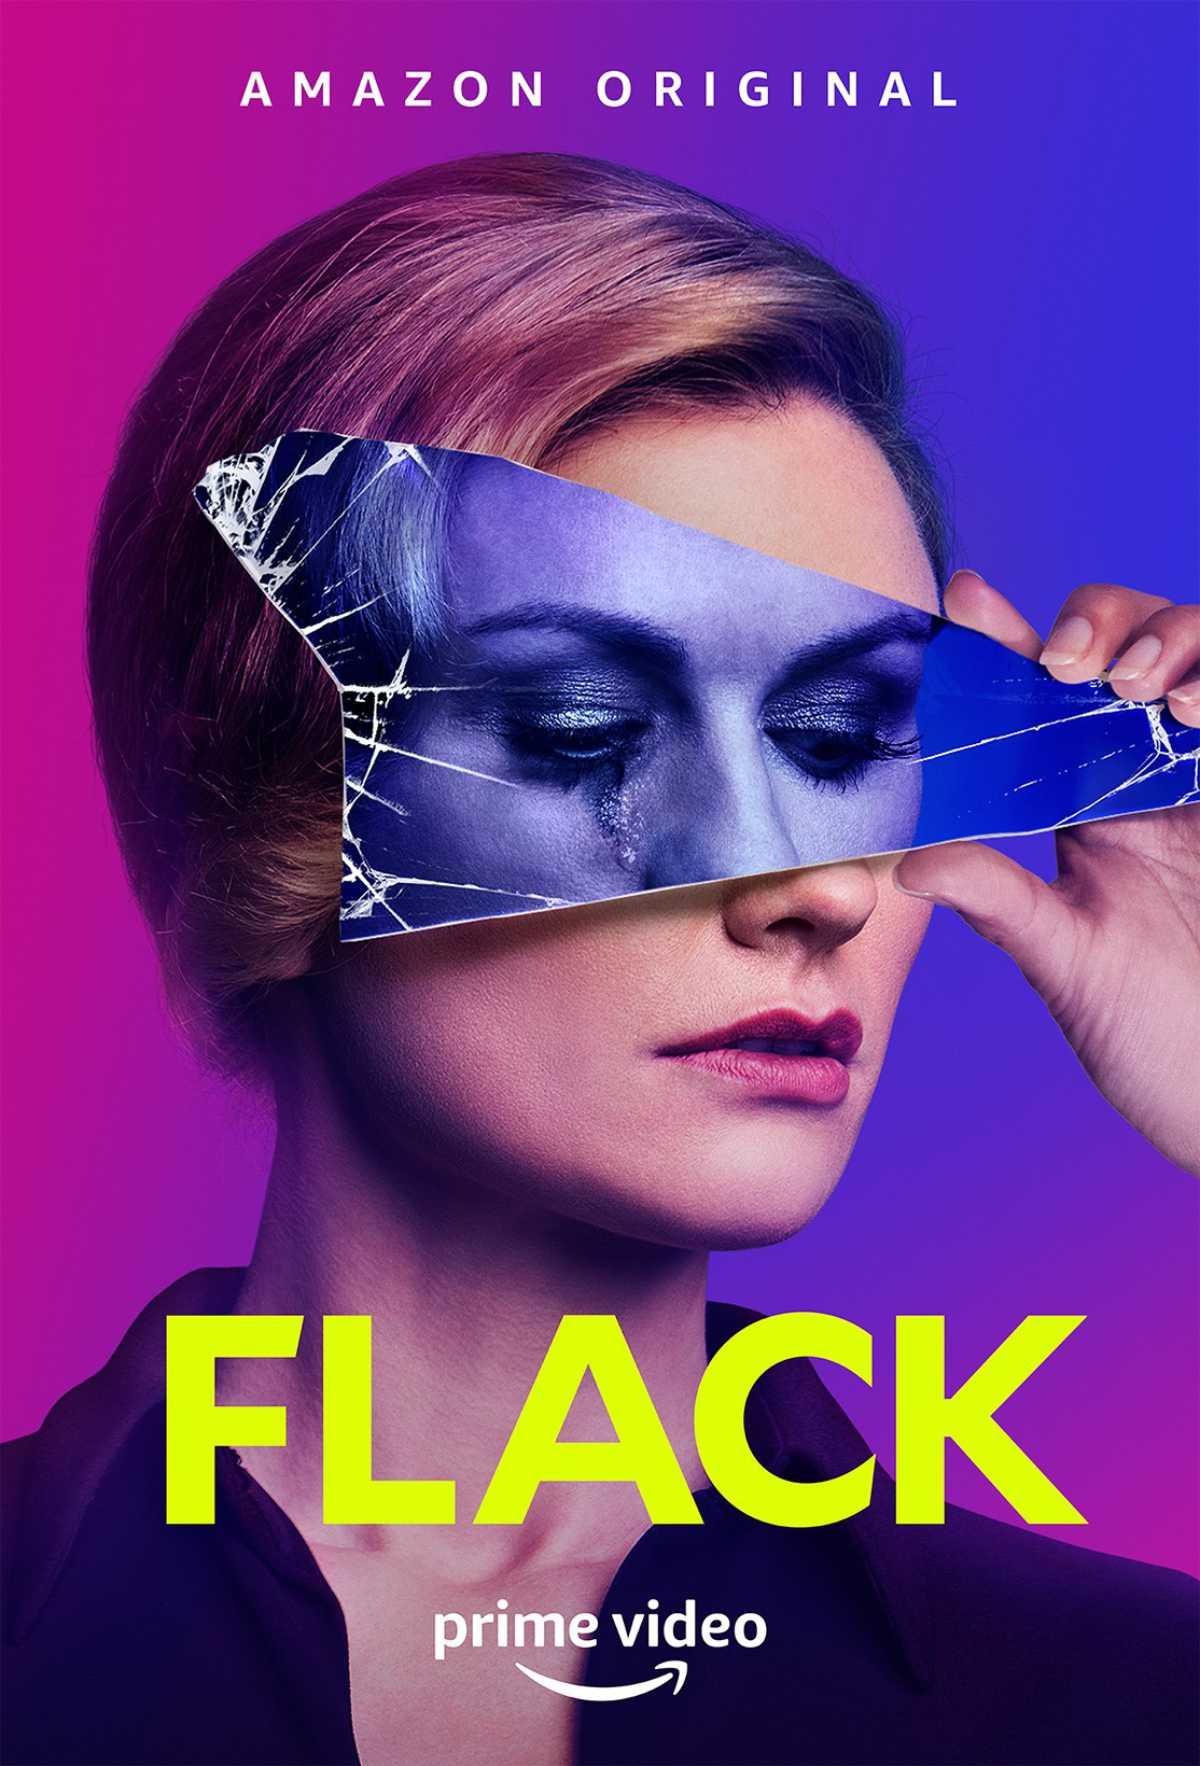 Flack Season 3: Release Date for Prime Video